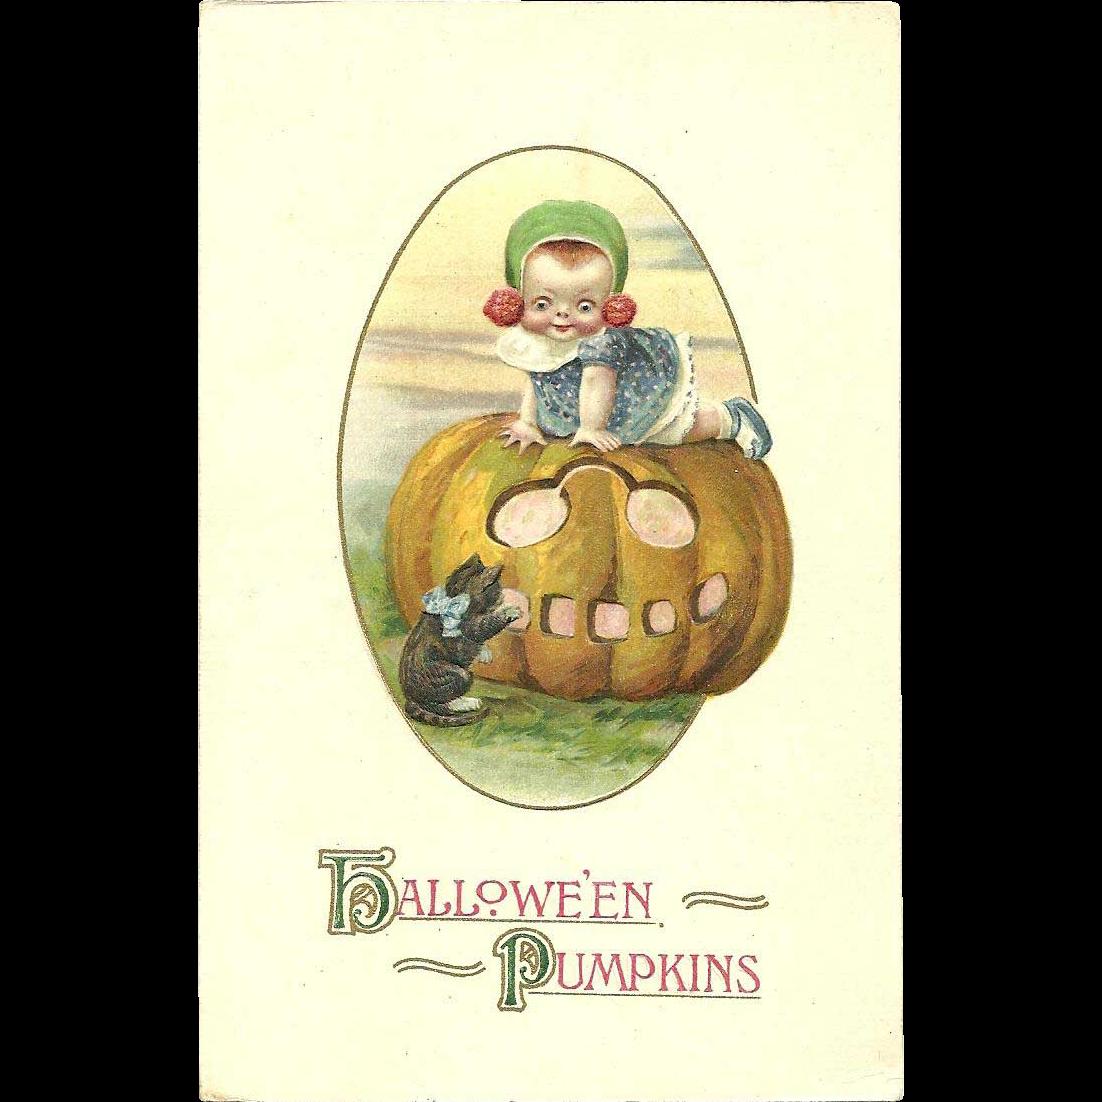 Scarce Winsch Schmucker Halloween Vintage Postcard